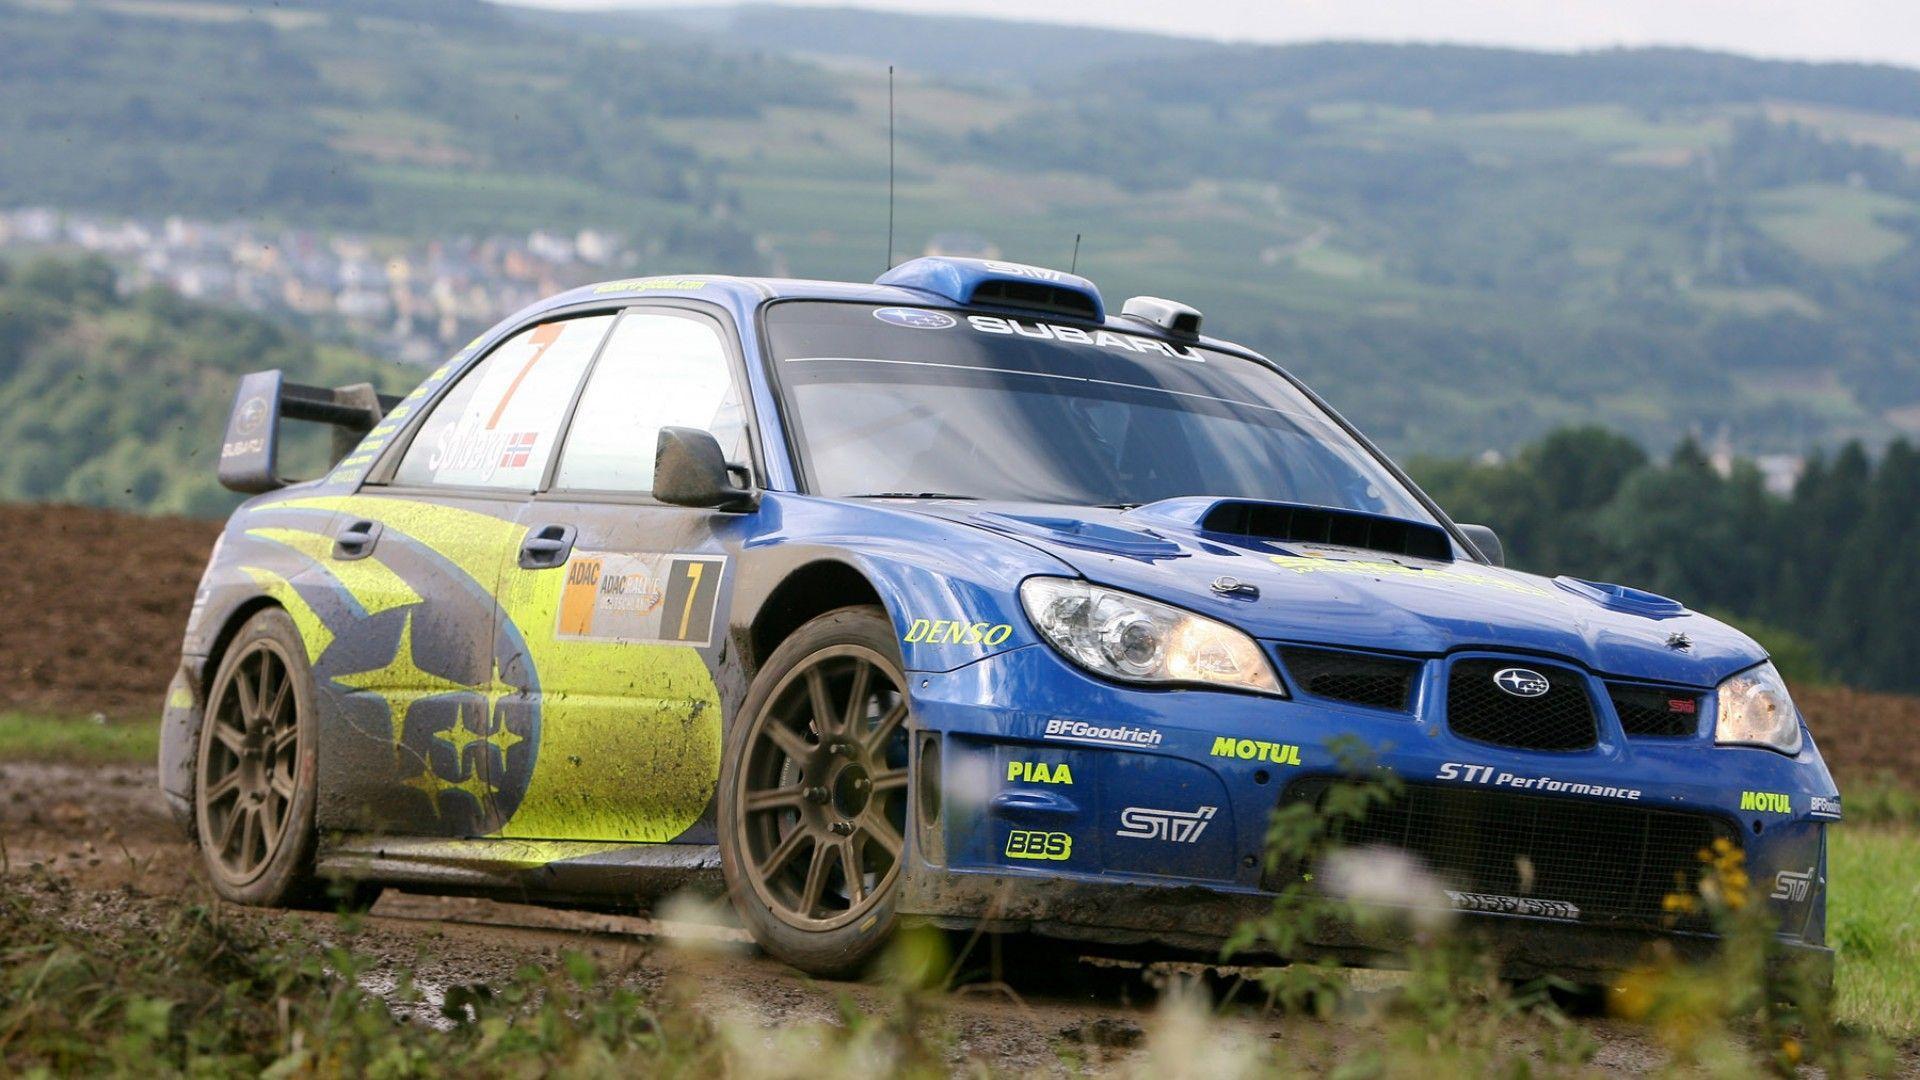 Subaru Rally Wallpapers Top Free Subaru Rally Backgrounds